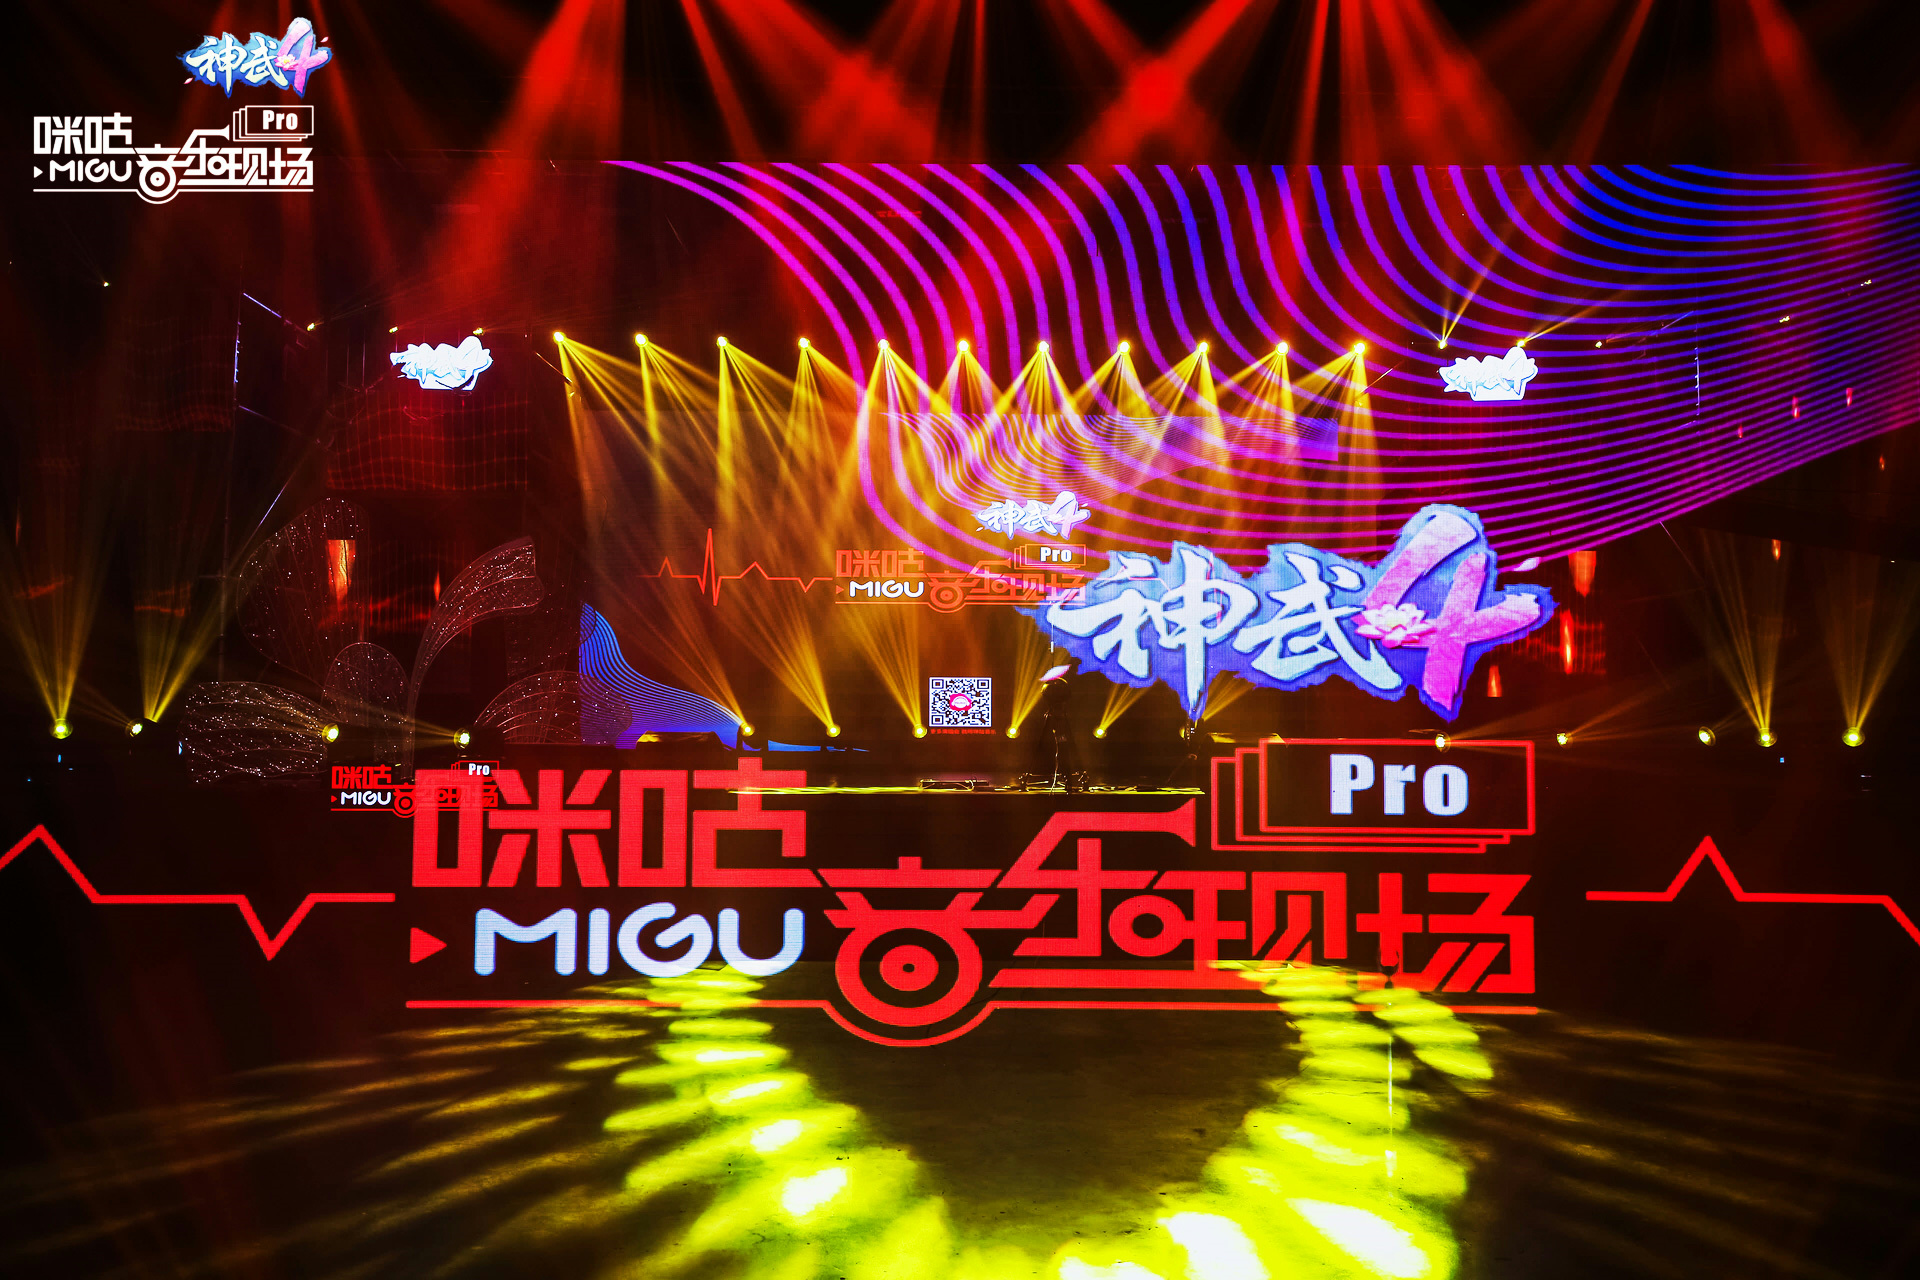 5G+VR沉浸式体验 《神武4》携手咪咕音乐举办首场线上音乐会